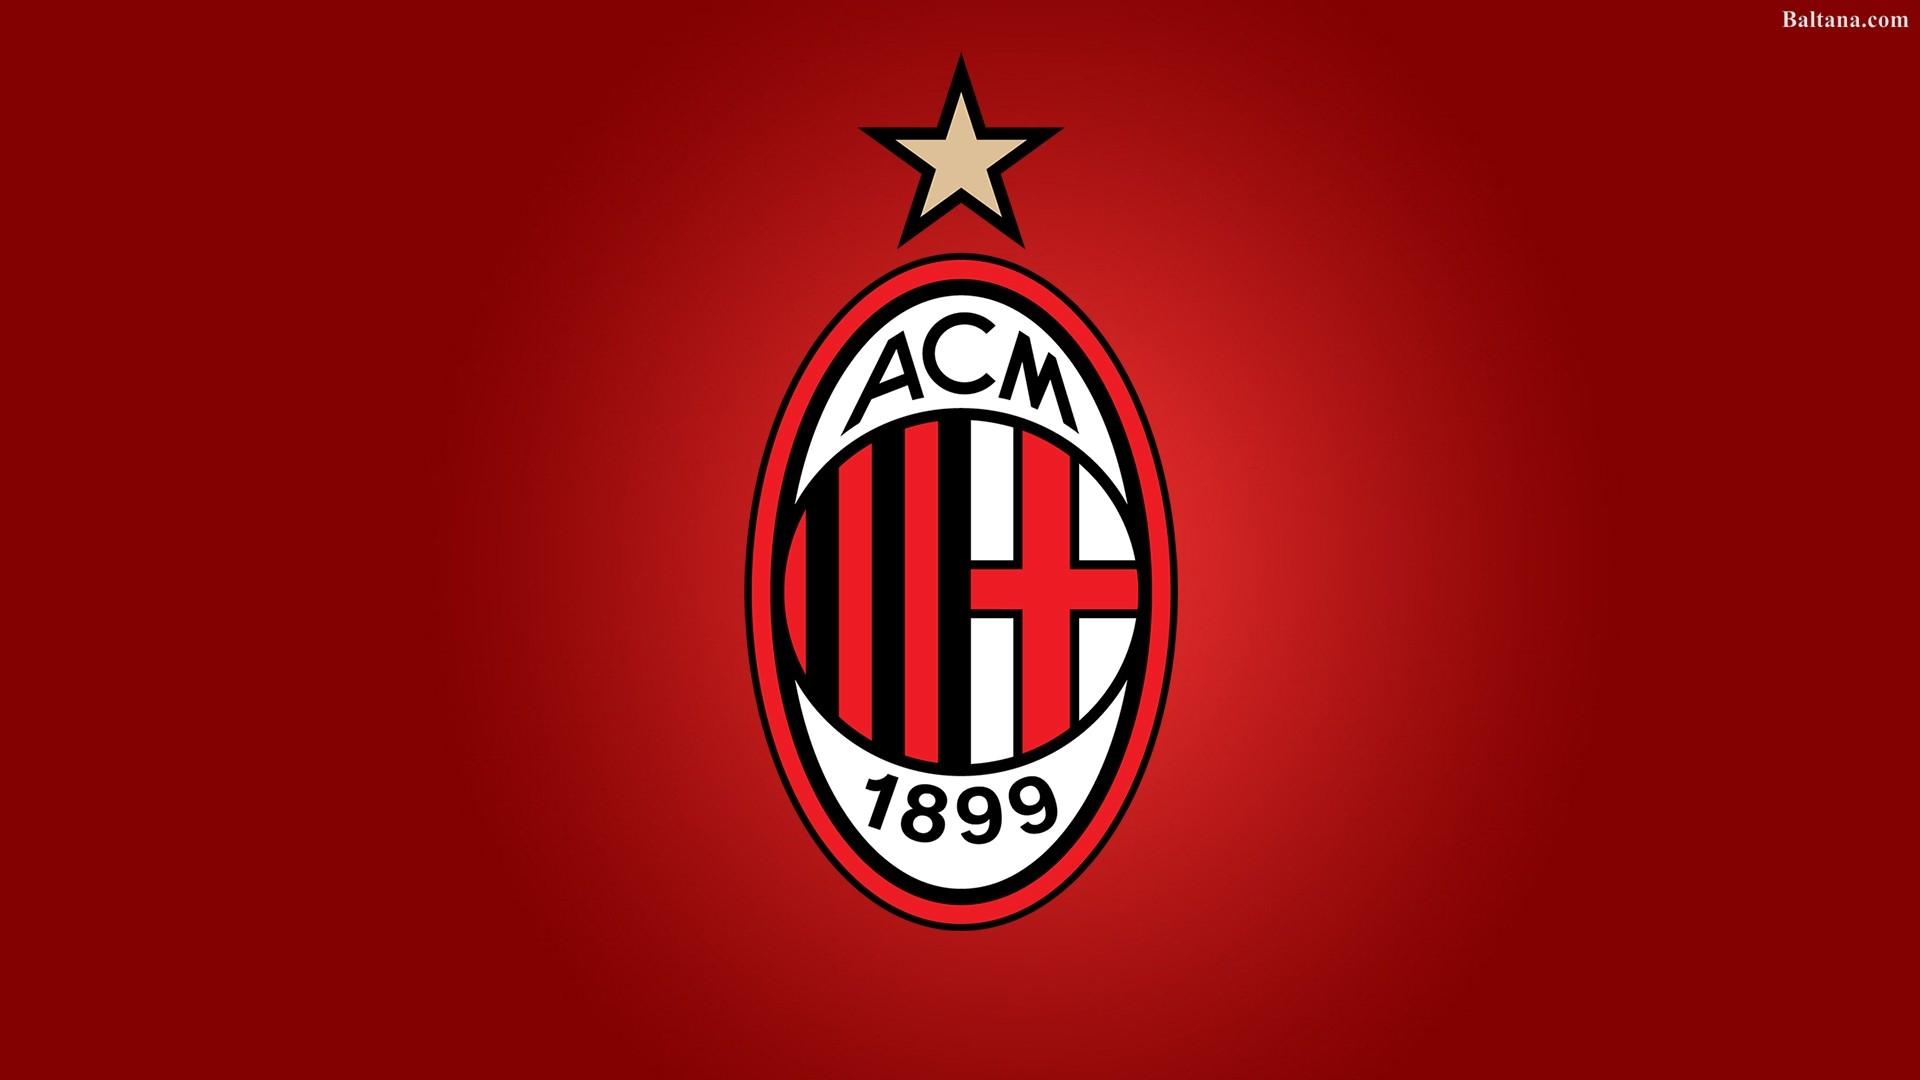 Ac Milan Full HD Wallpaper